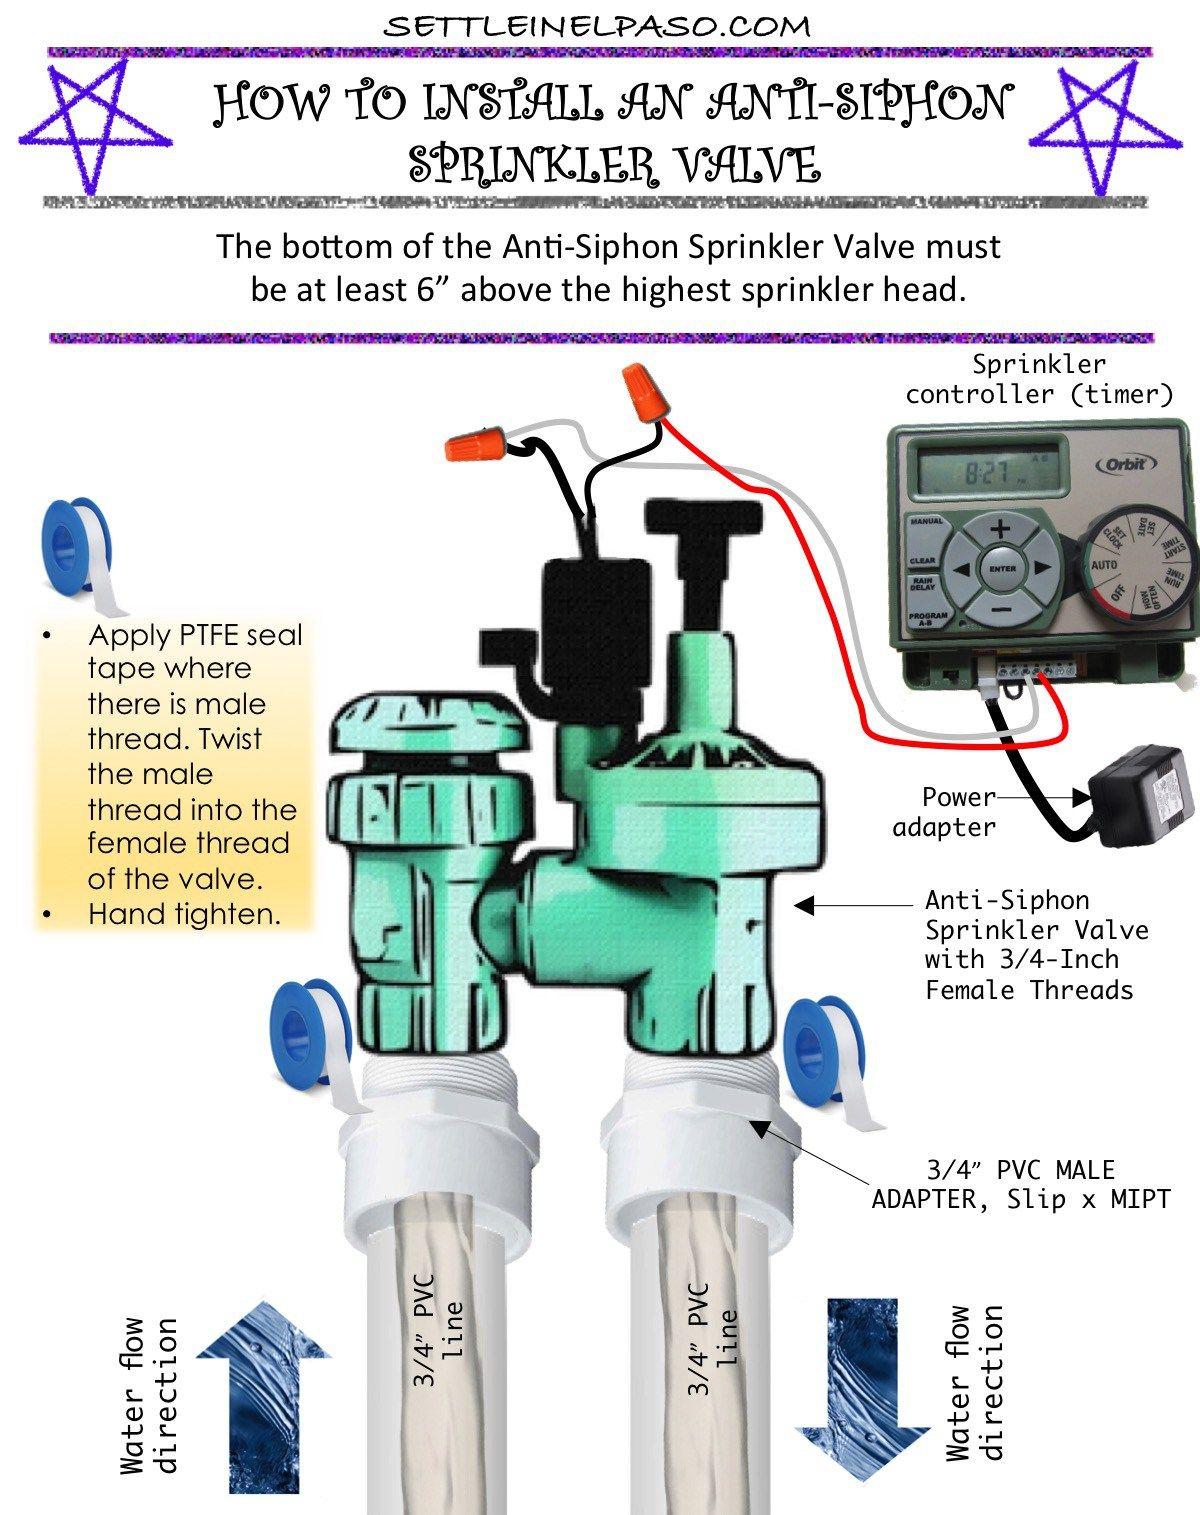 Sprinkler Valve Installation Diy A Family Blog Sprinkler Valve Sprinkler System Diy Sprinkler System Design